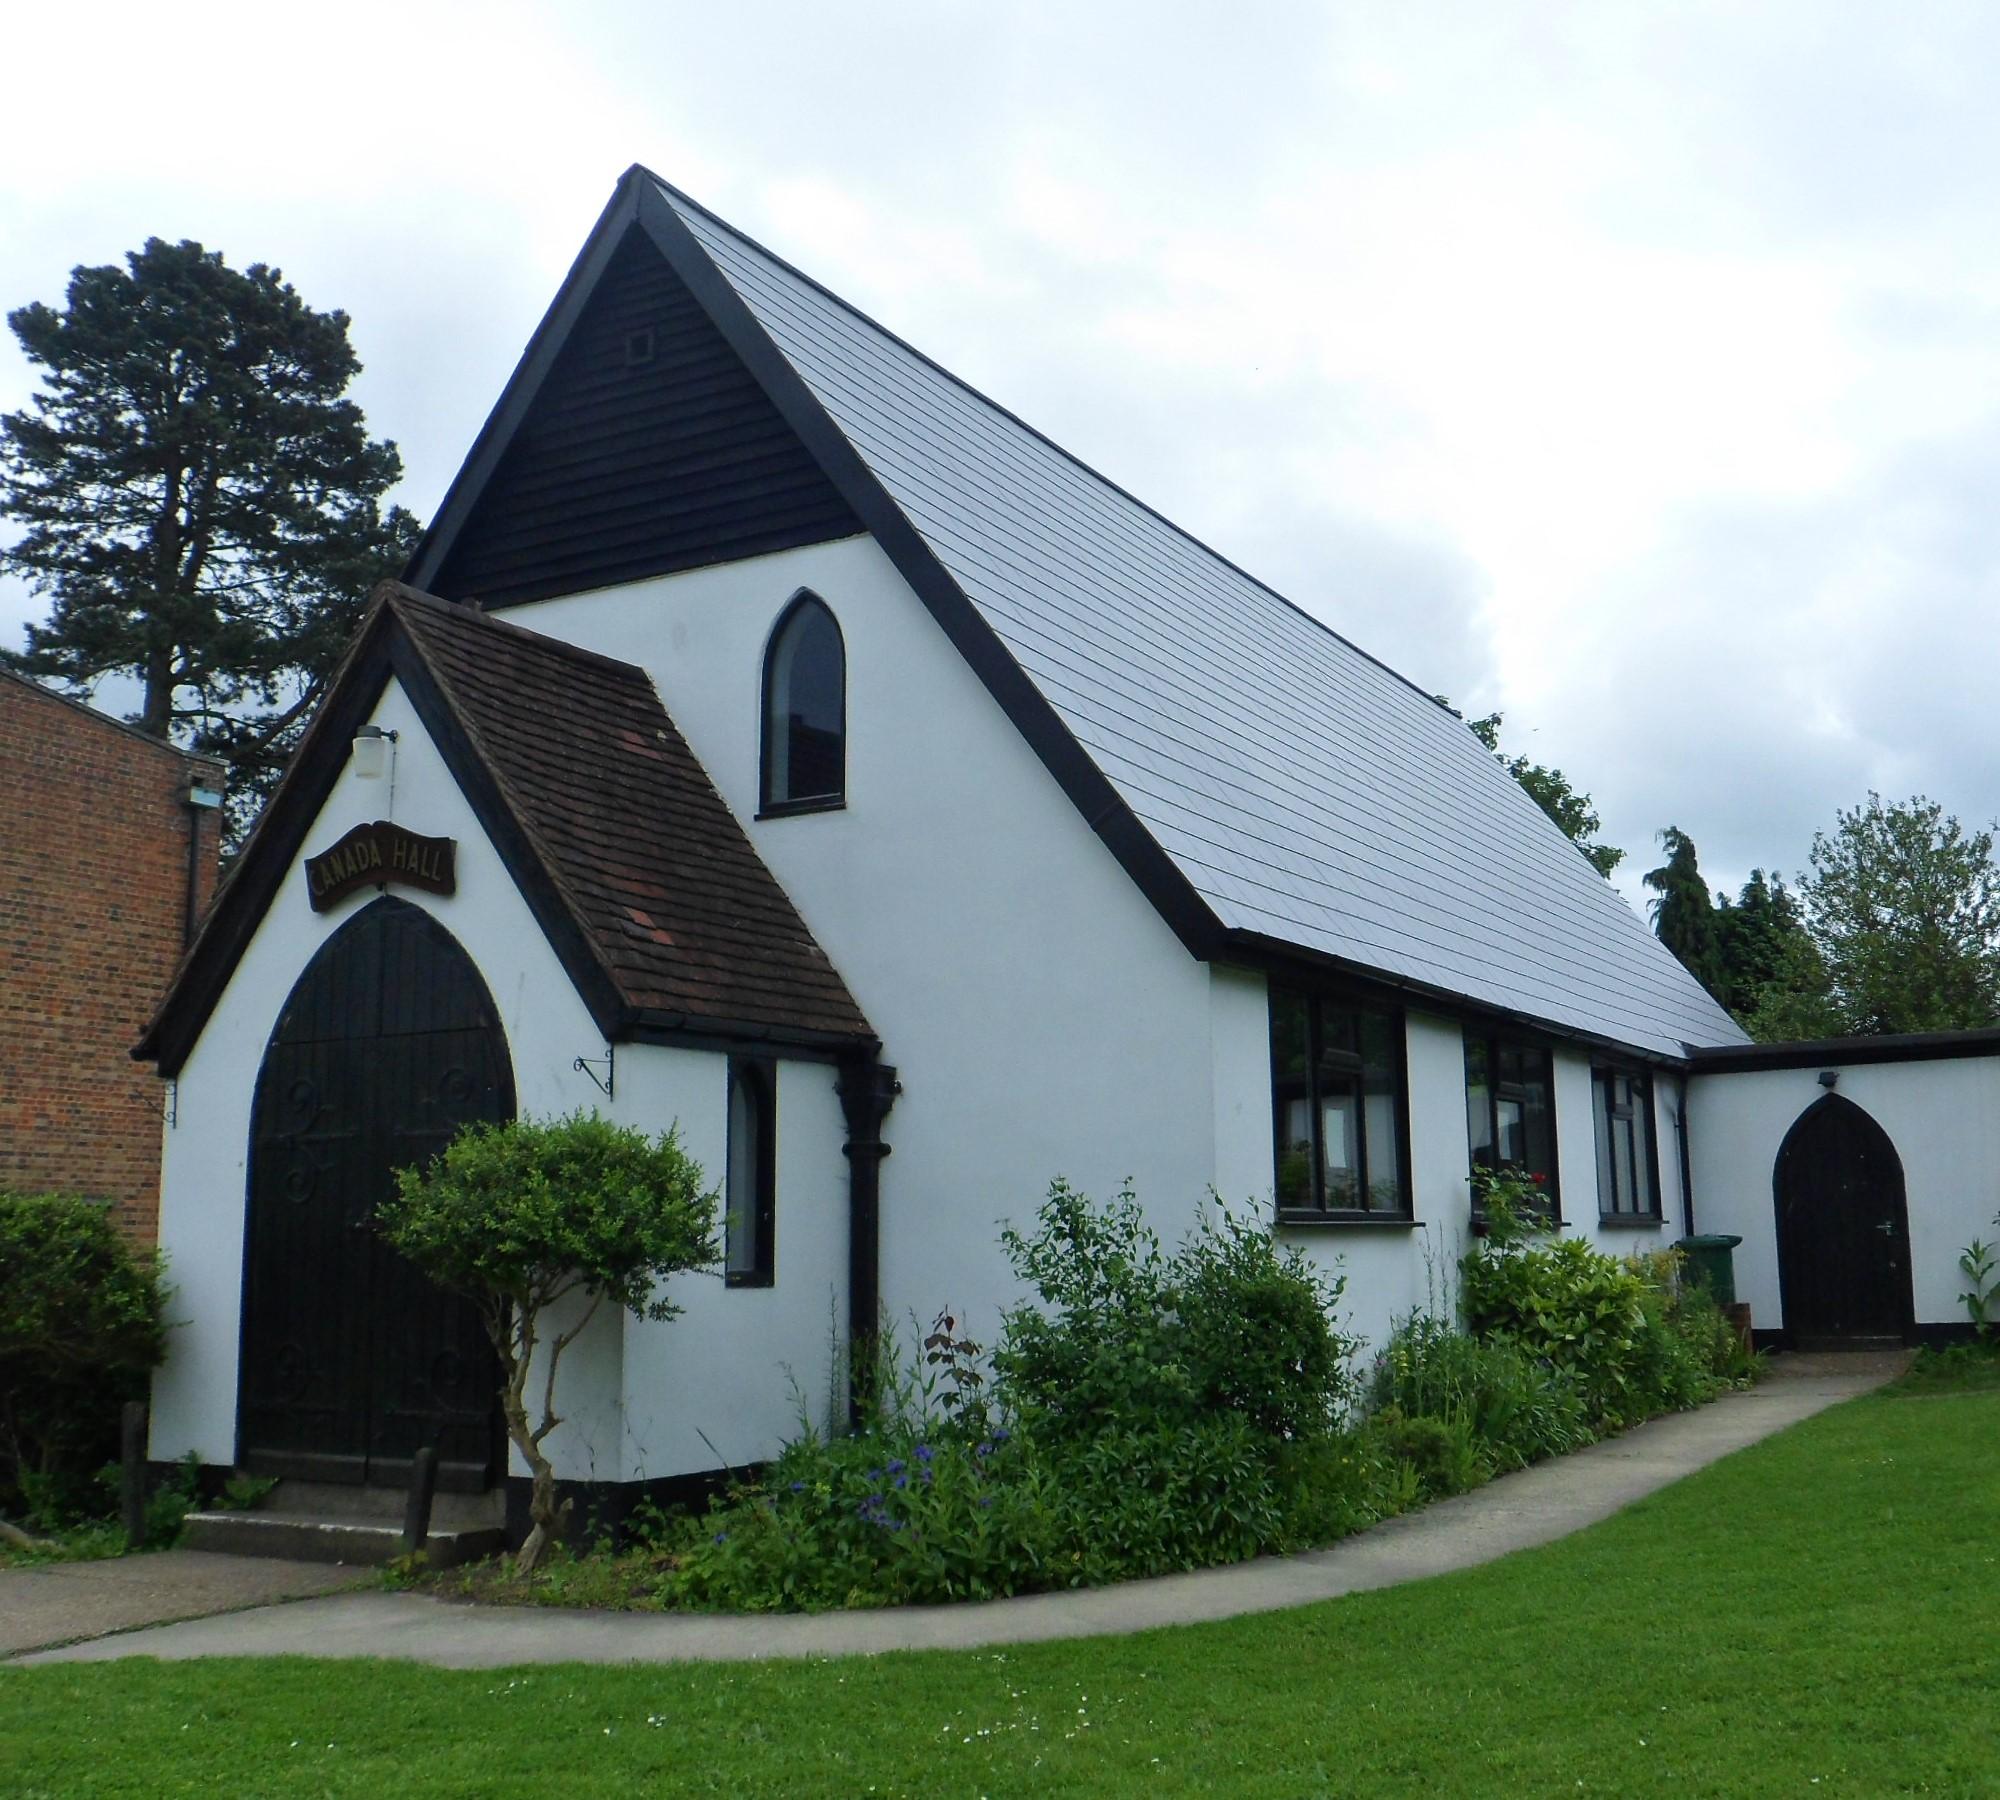 FileCanada Hall All Saints Church Nutfield Road South Merstham June